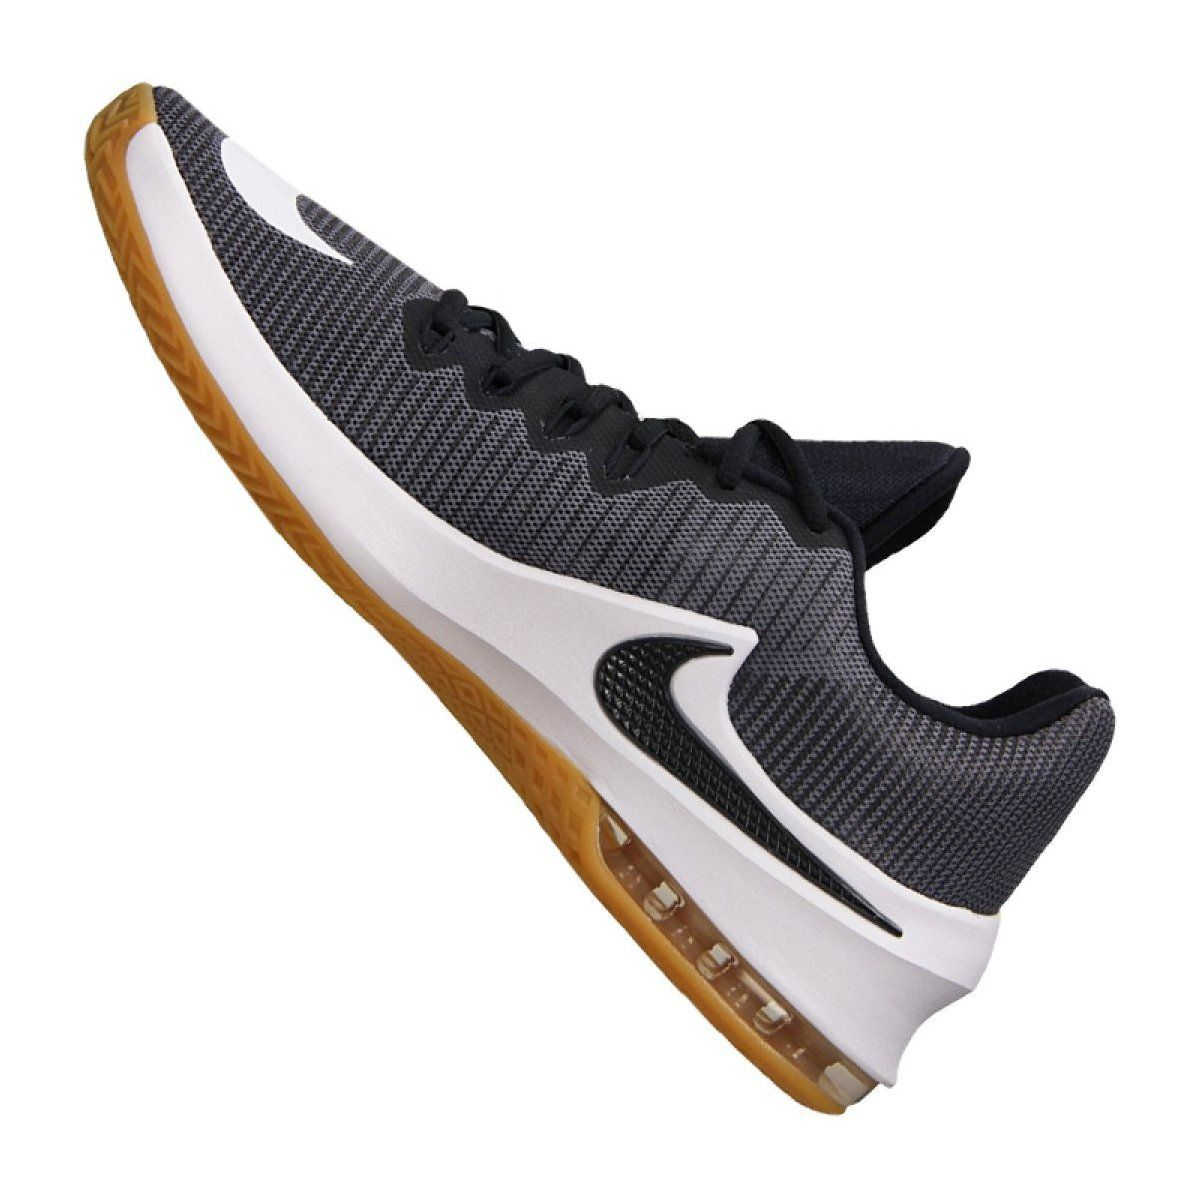 Buty Nike Air Max Infuriate 2 Low M 908975 042 Czarne Wielokolorowe Nike Nike Air Max Nike Air